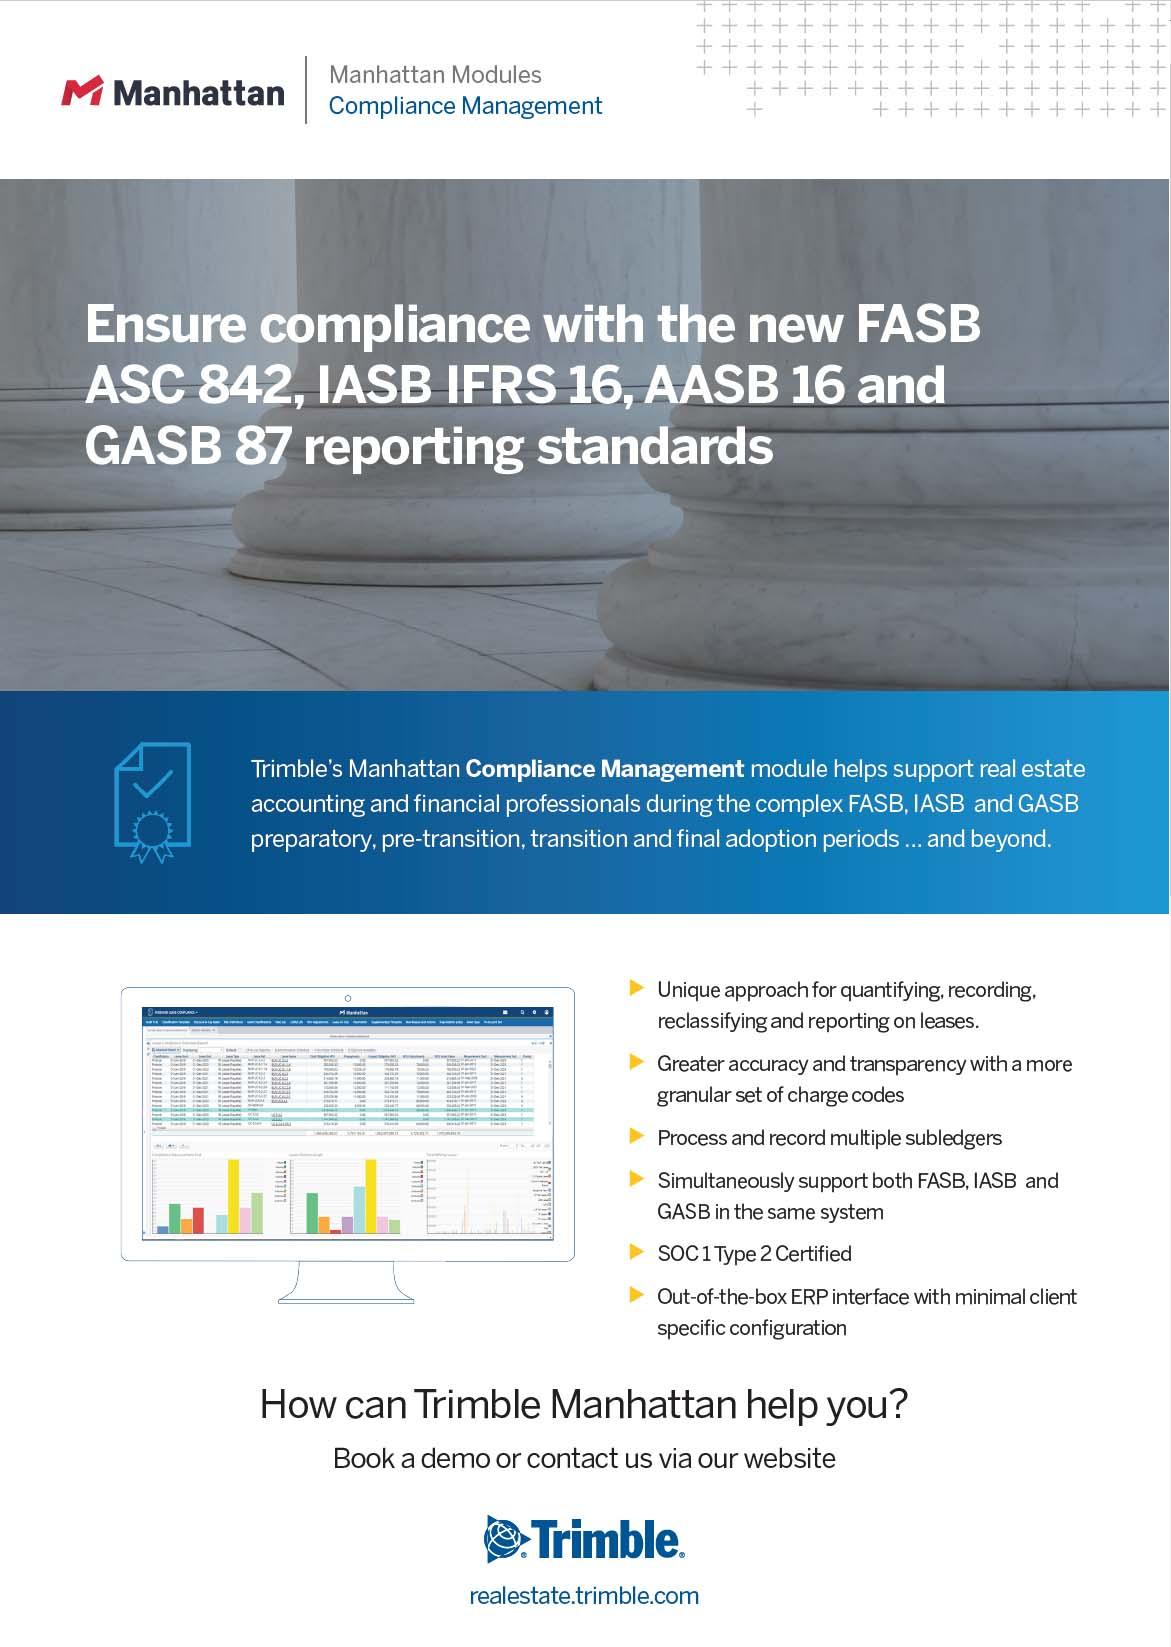 Manhattan – Compliance Management